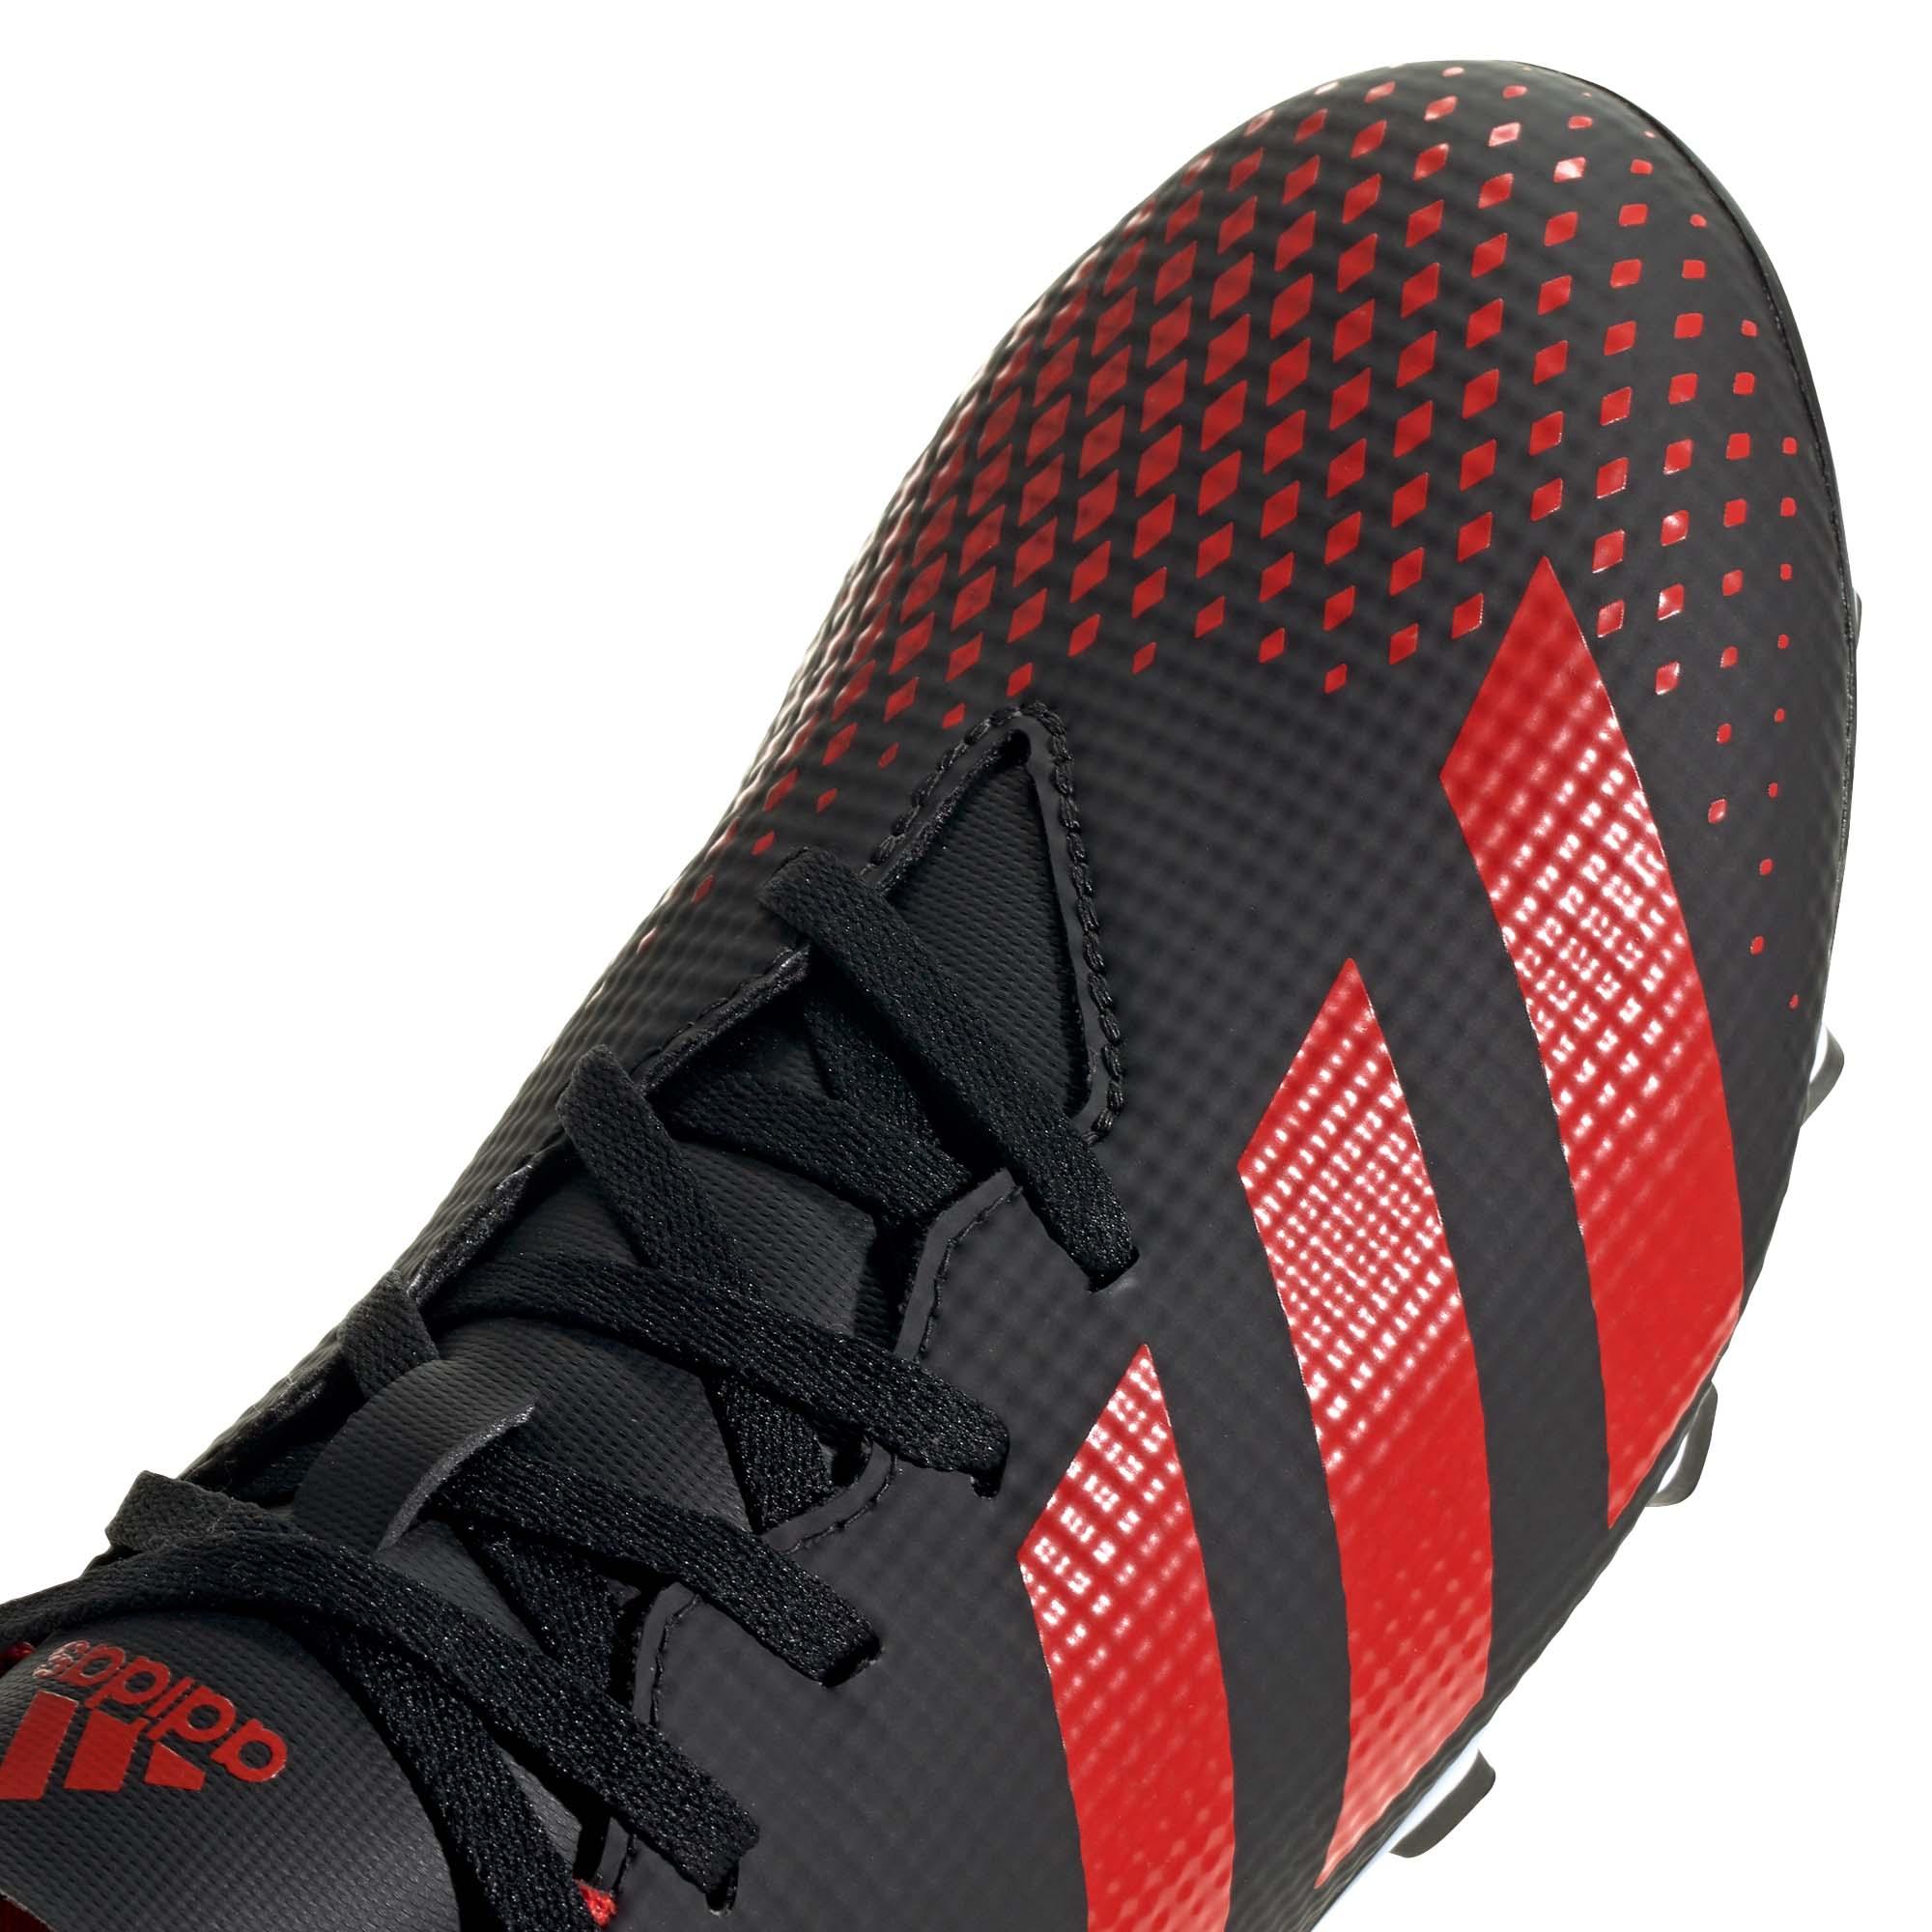 Adidas-Predator-20-4-FXG-Firm-Ground-pour-homme-Football-Boot-Noir-Rouge miniature 9